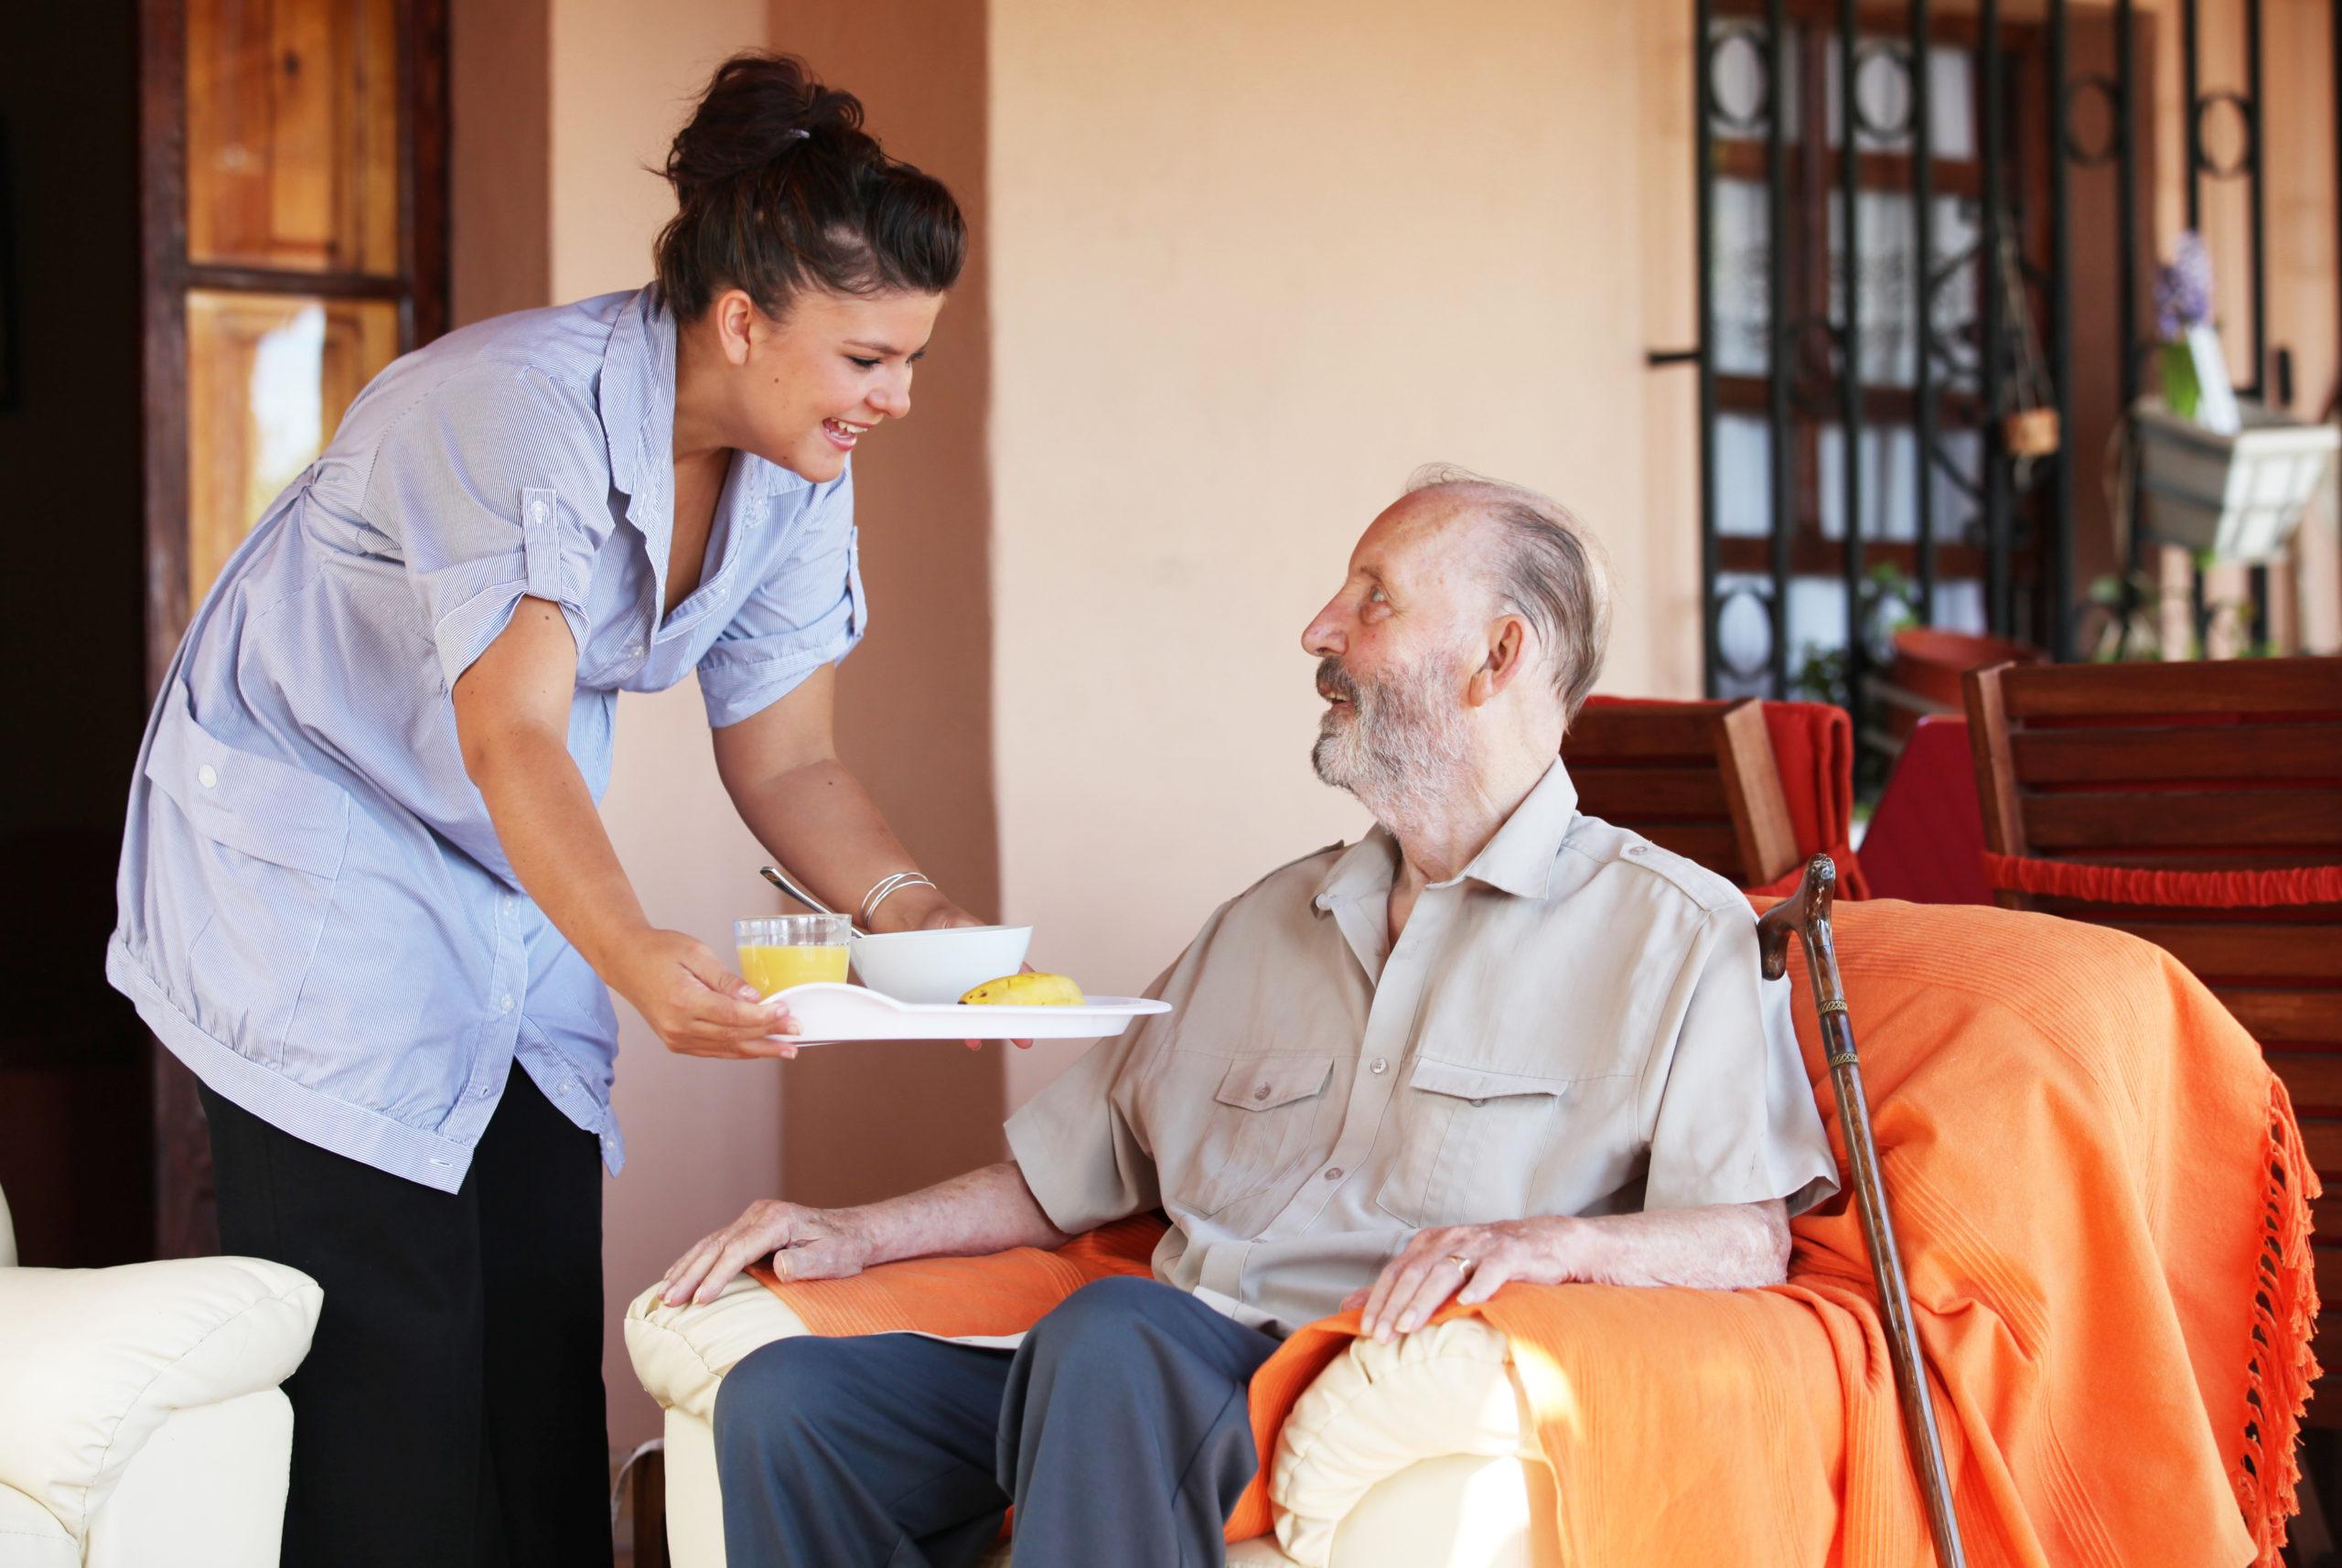 Elderly Senior Being Brought Meal By Carer Or Nurse